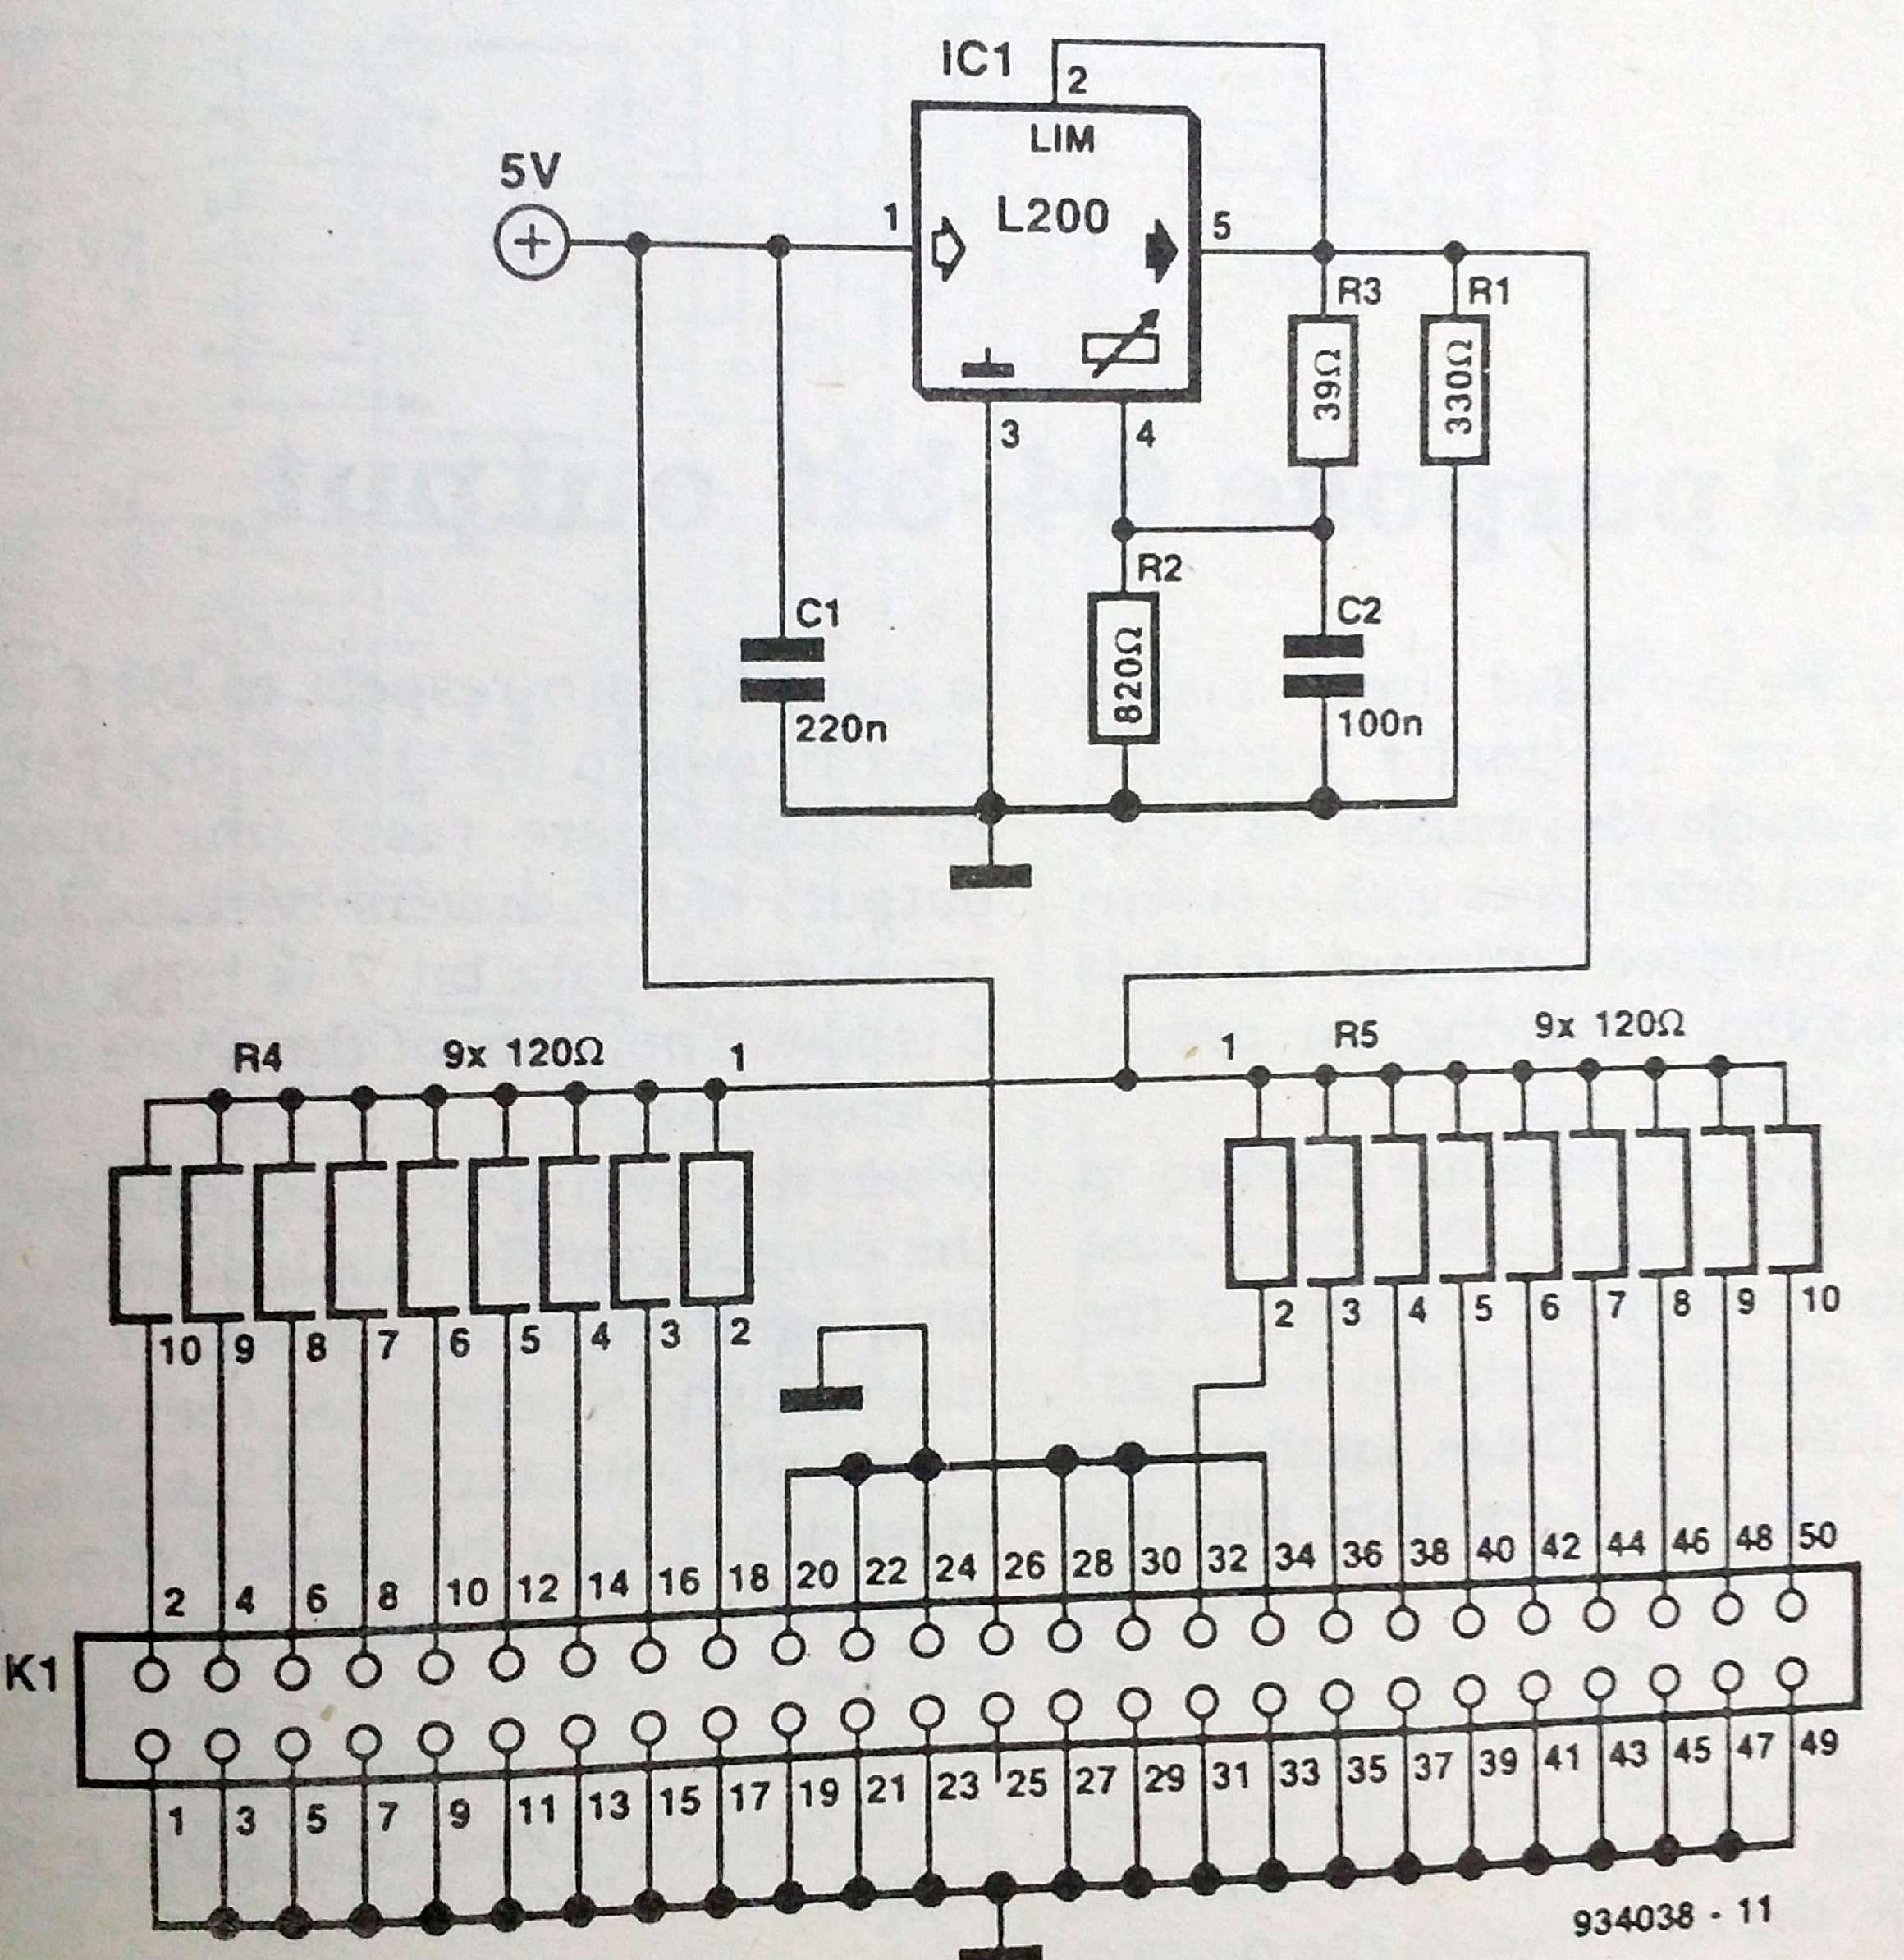 scsi active termination scsi wiring diagram 50 pin scsi pinout electronics and schematic circuit diagrams